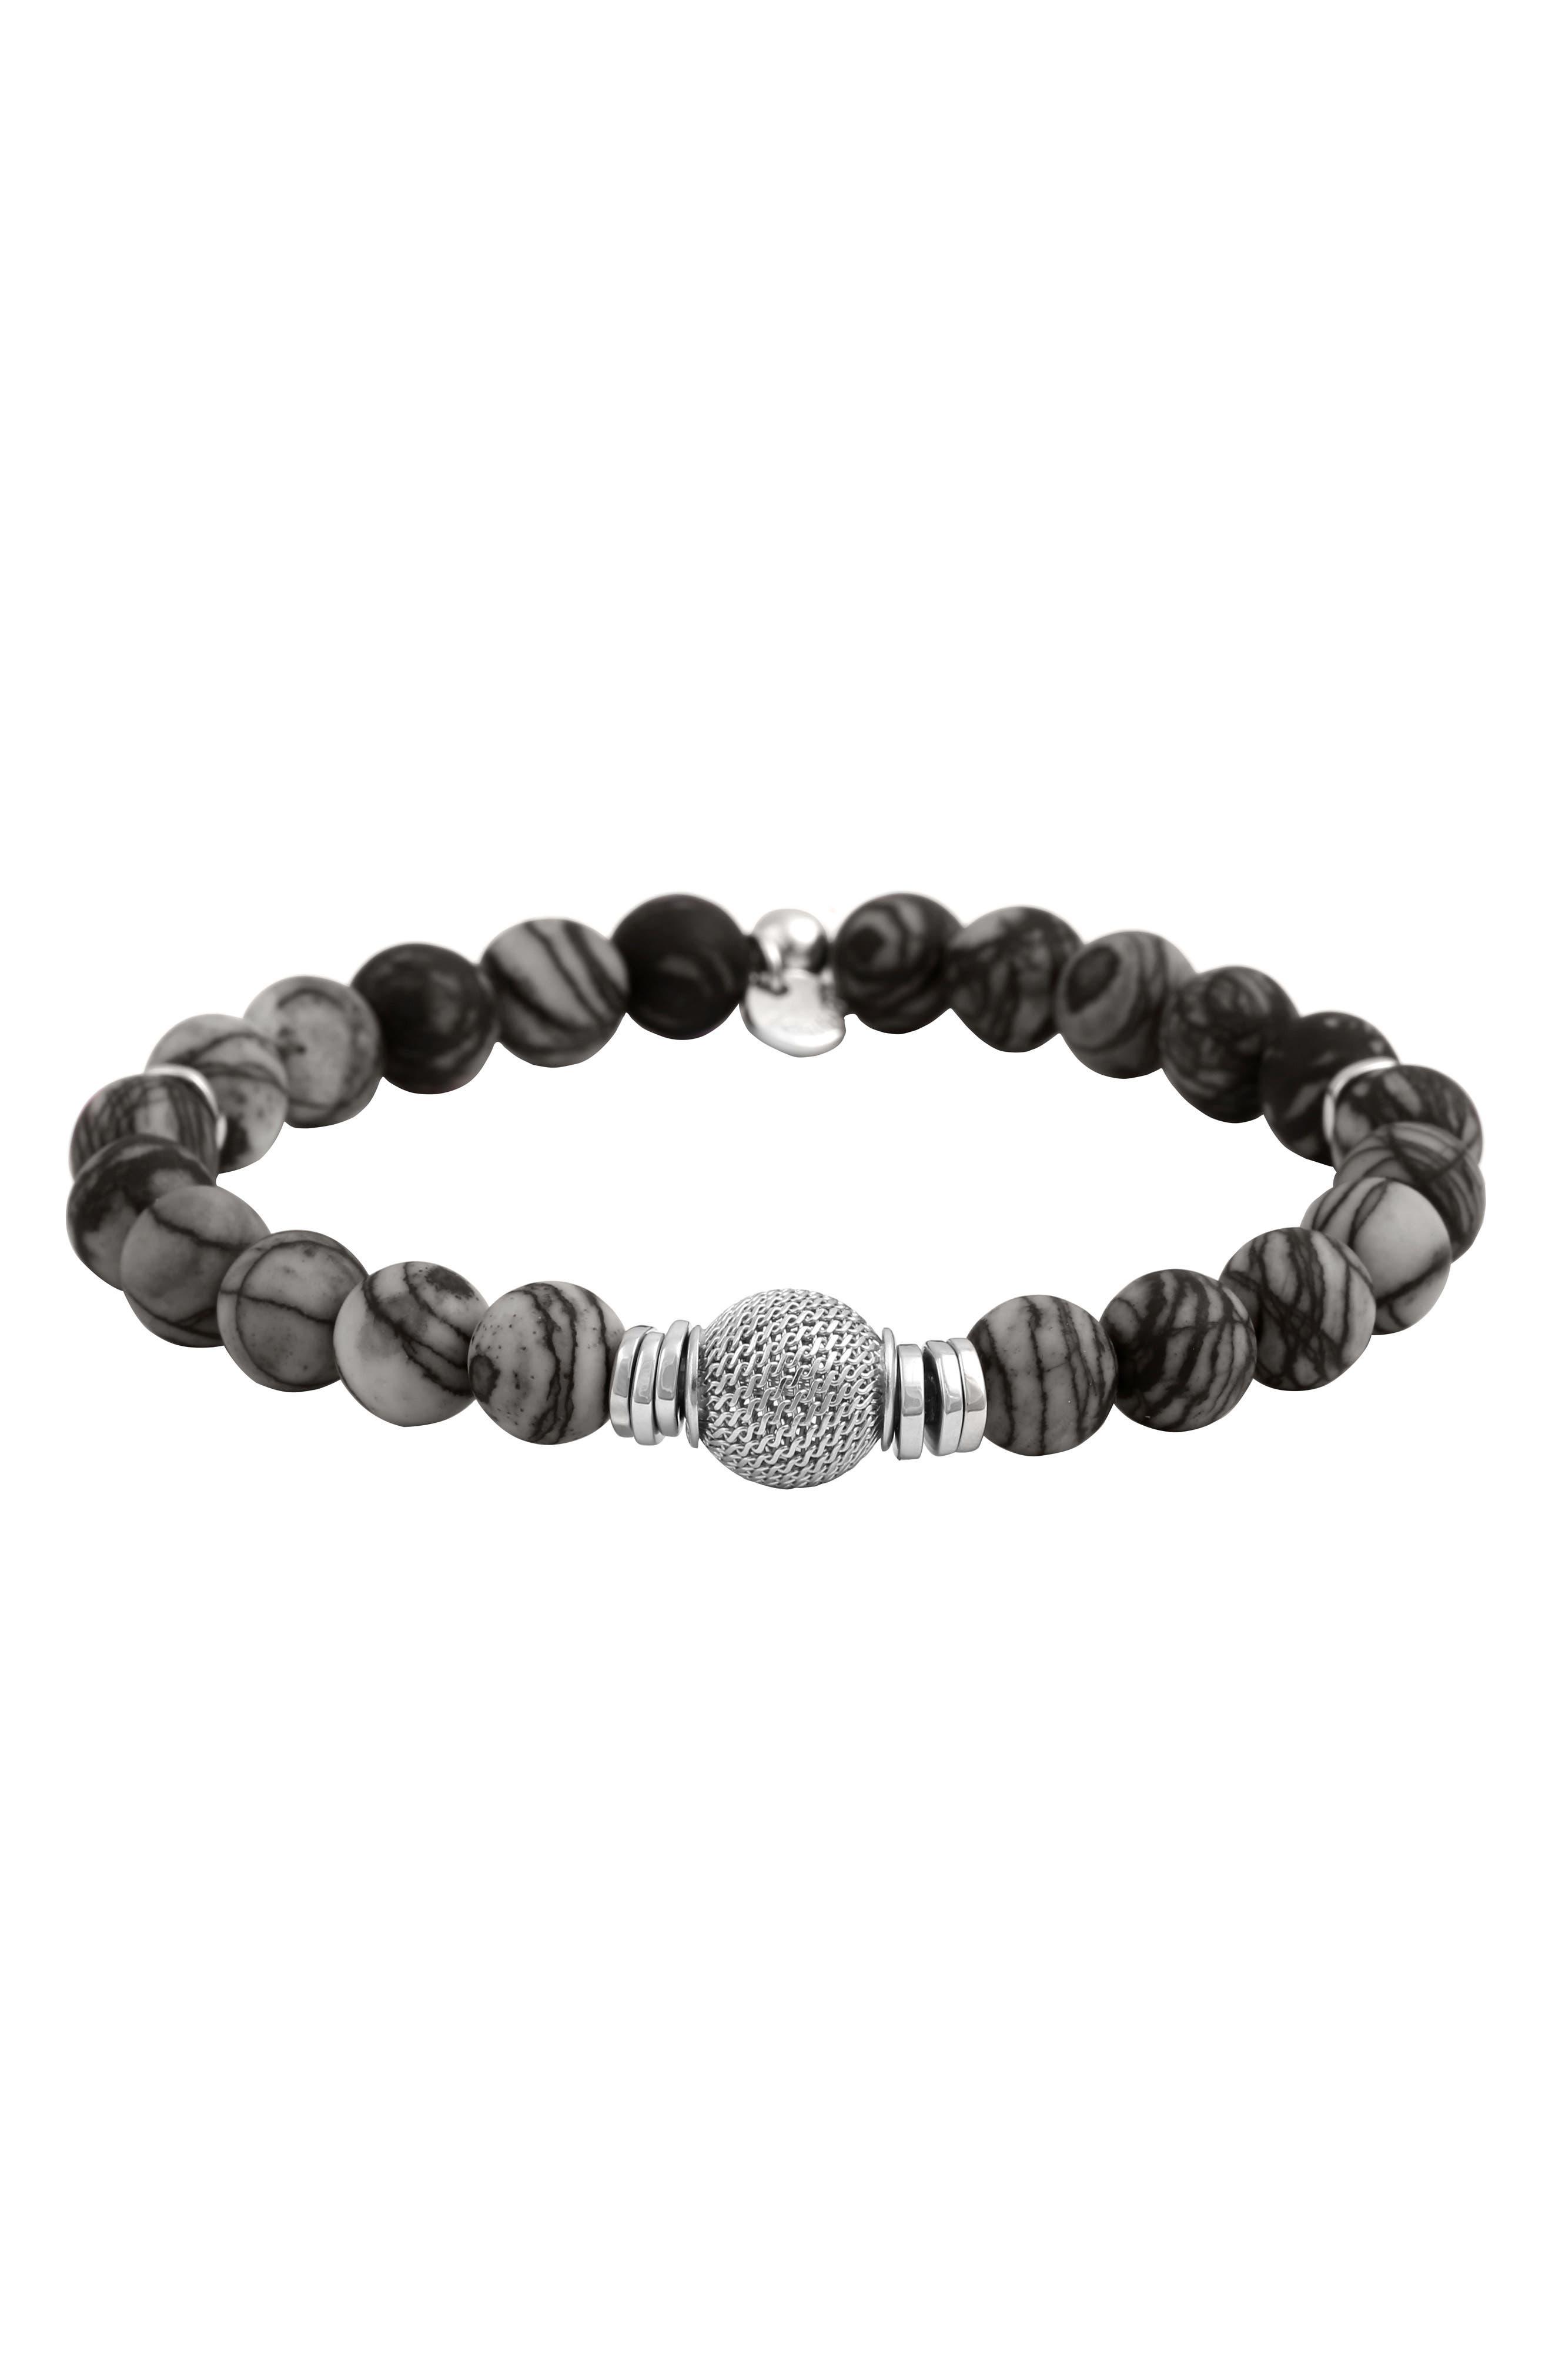 Main Image - Tateossian Stonehenge Bead Bracelet